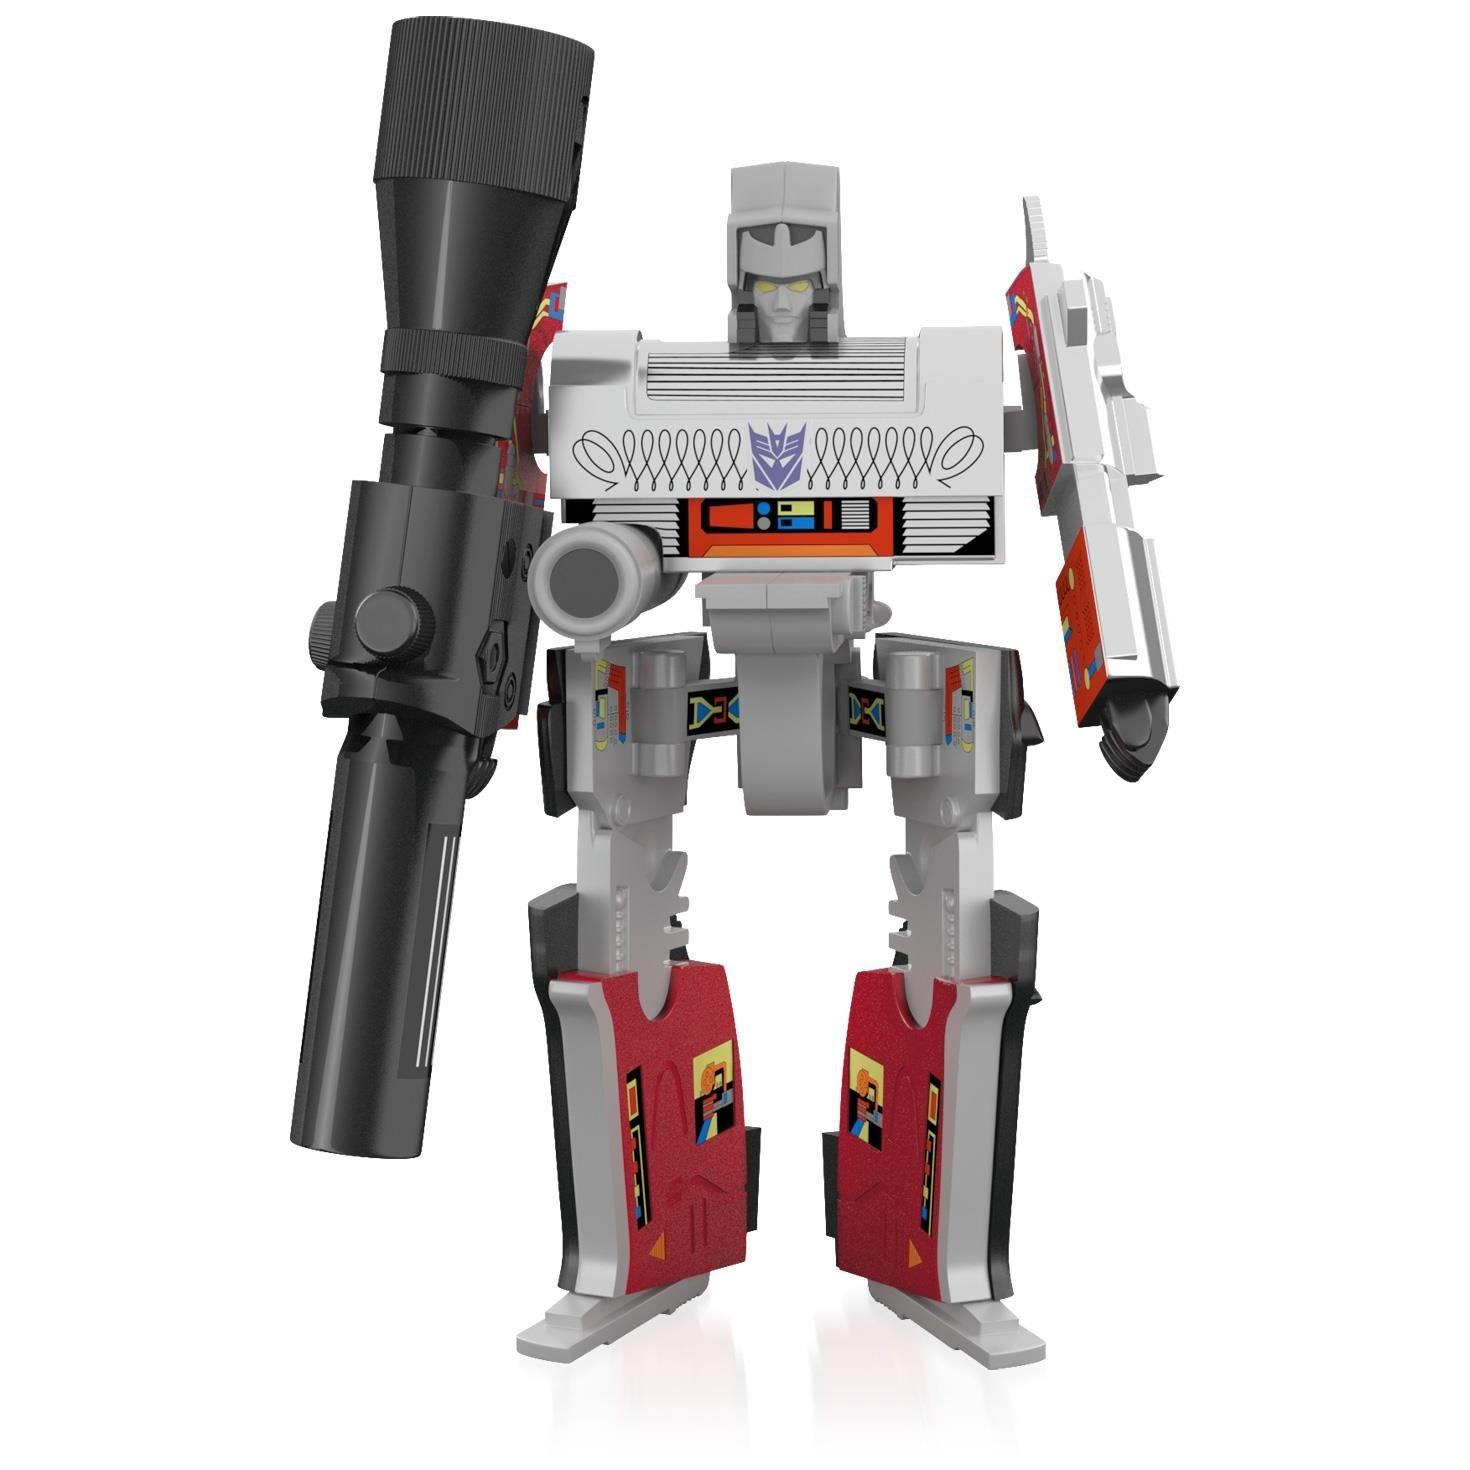 Hasbro - Transformers - Megatron Ornament 2015 Hallmark